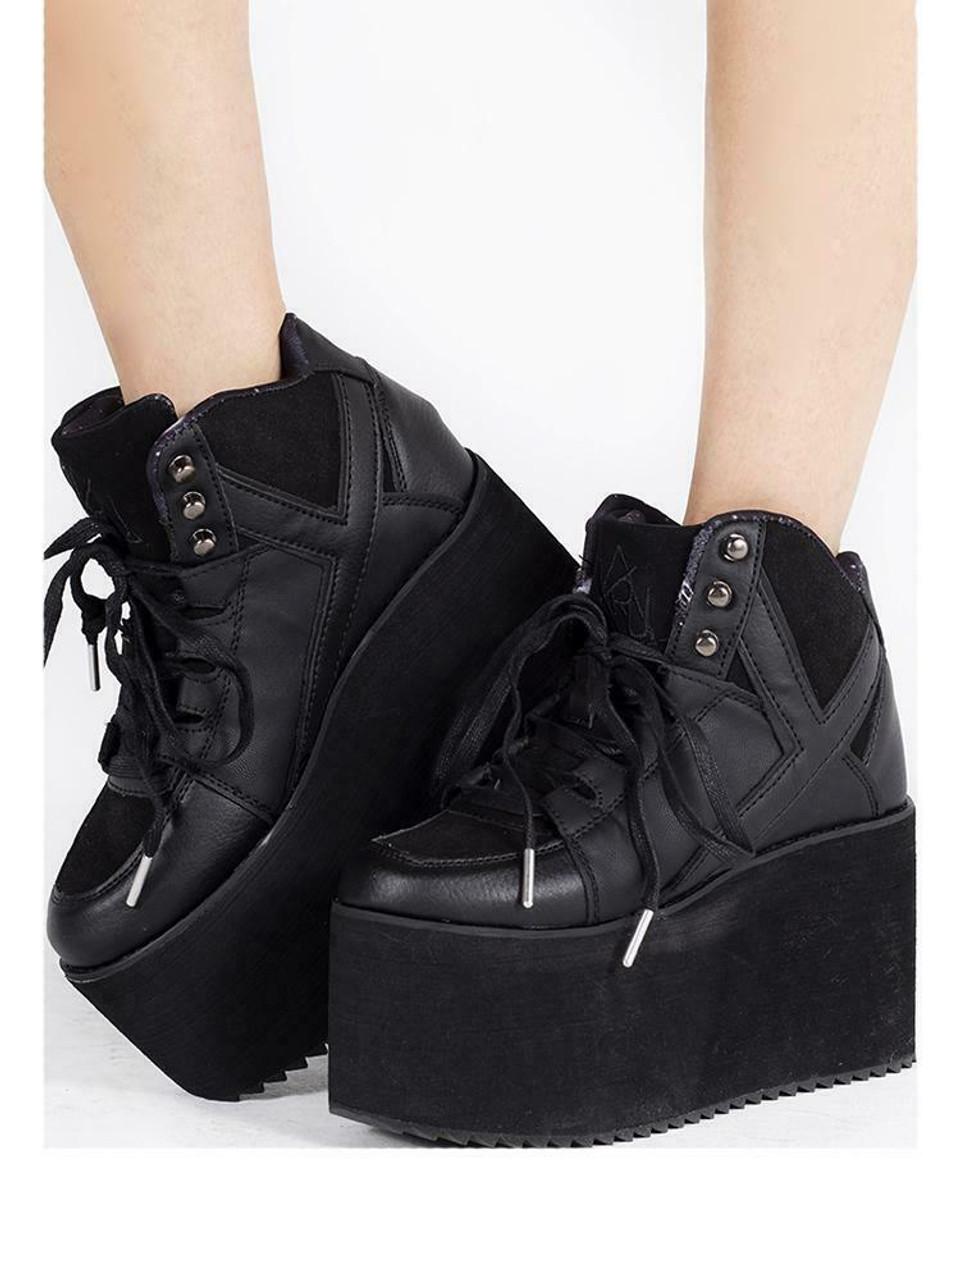 YRU Qozmo Hi Kawaii Punk Emo Rave Gothic Black Platforms Sneakers Heels Shoes